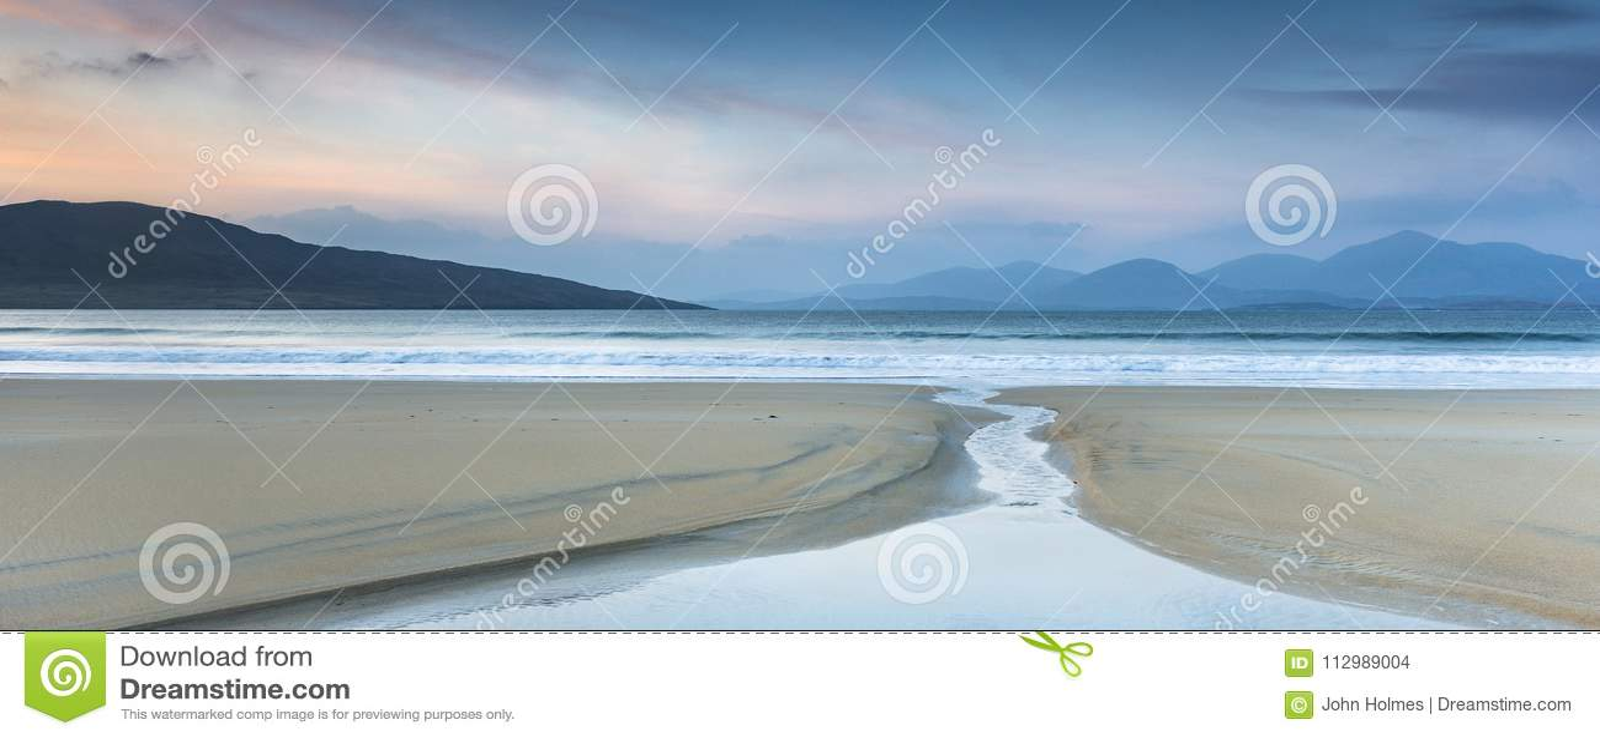 Luskentyre beach on the Isle of Harris in Scotland.